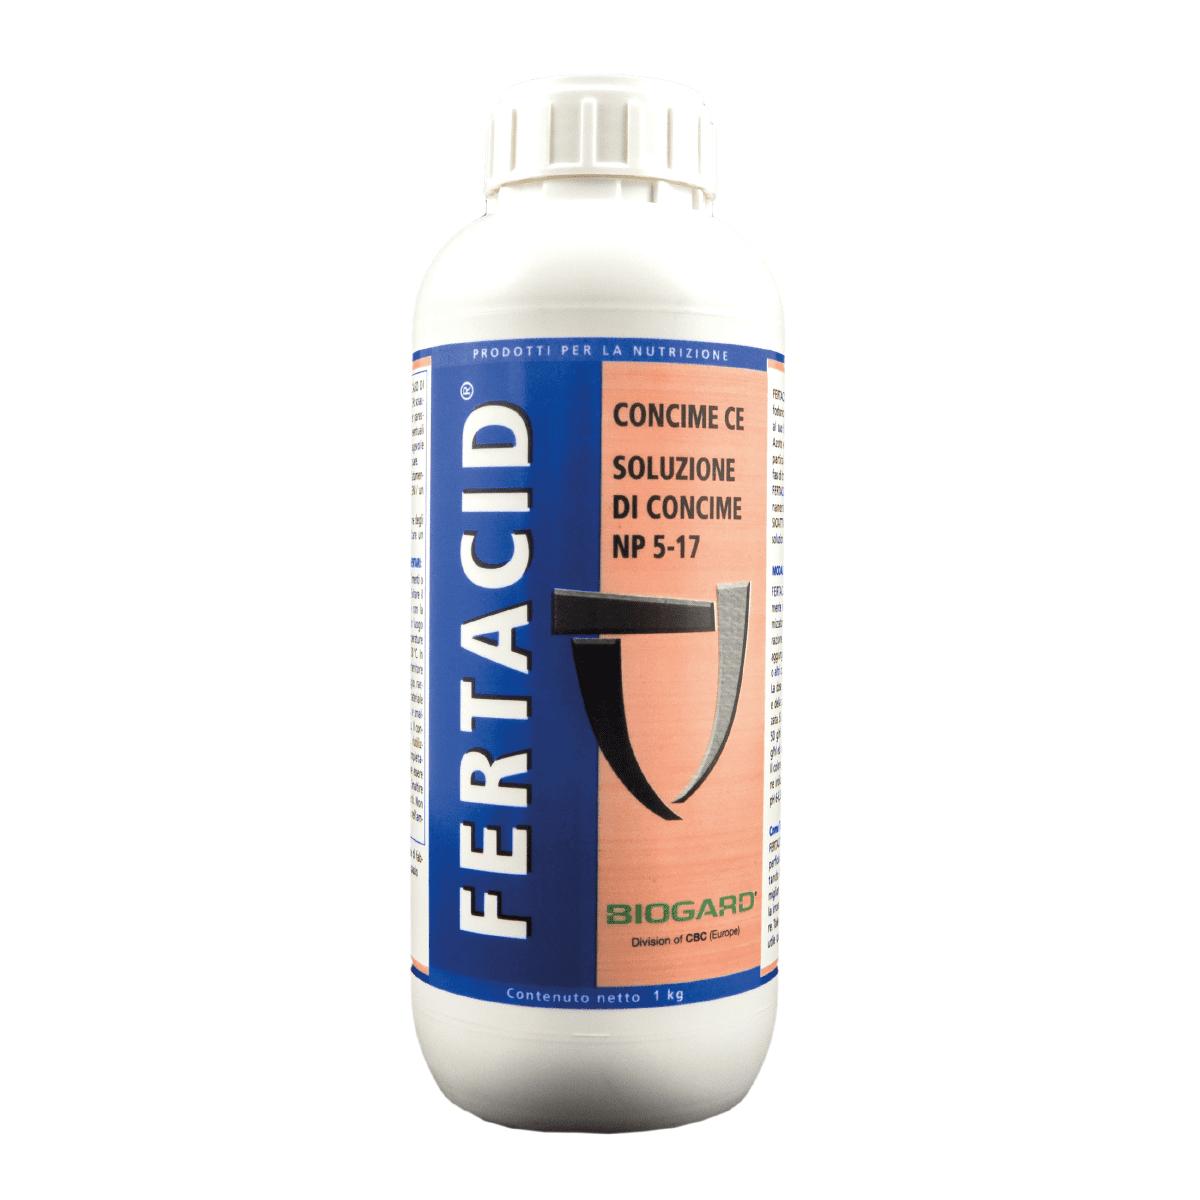 Biogard - Fertacid®